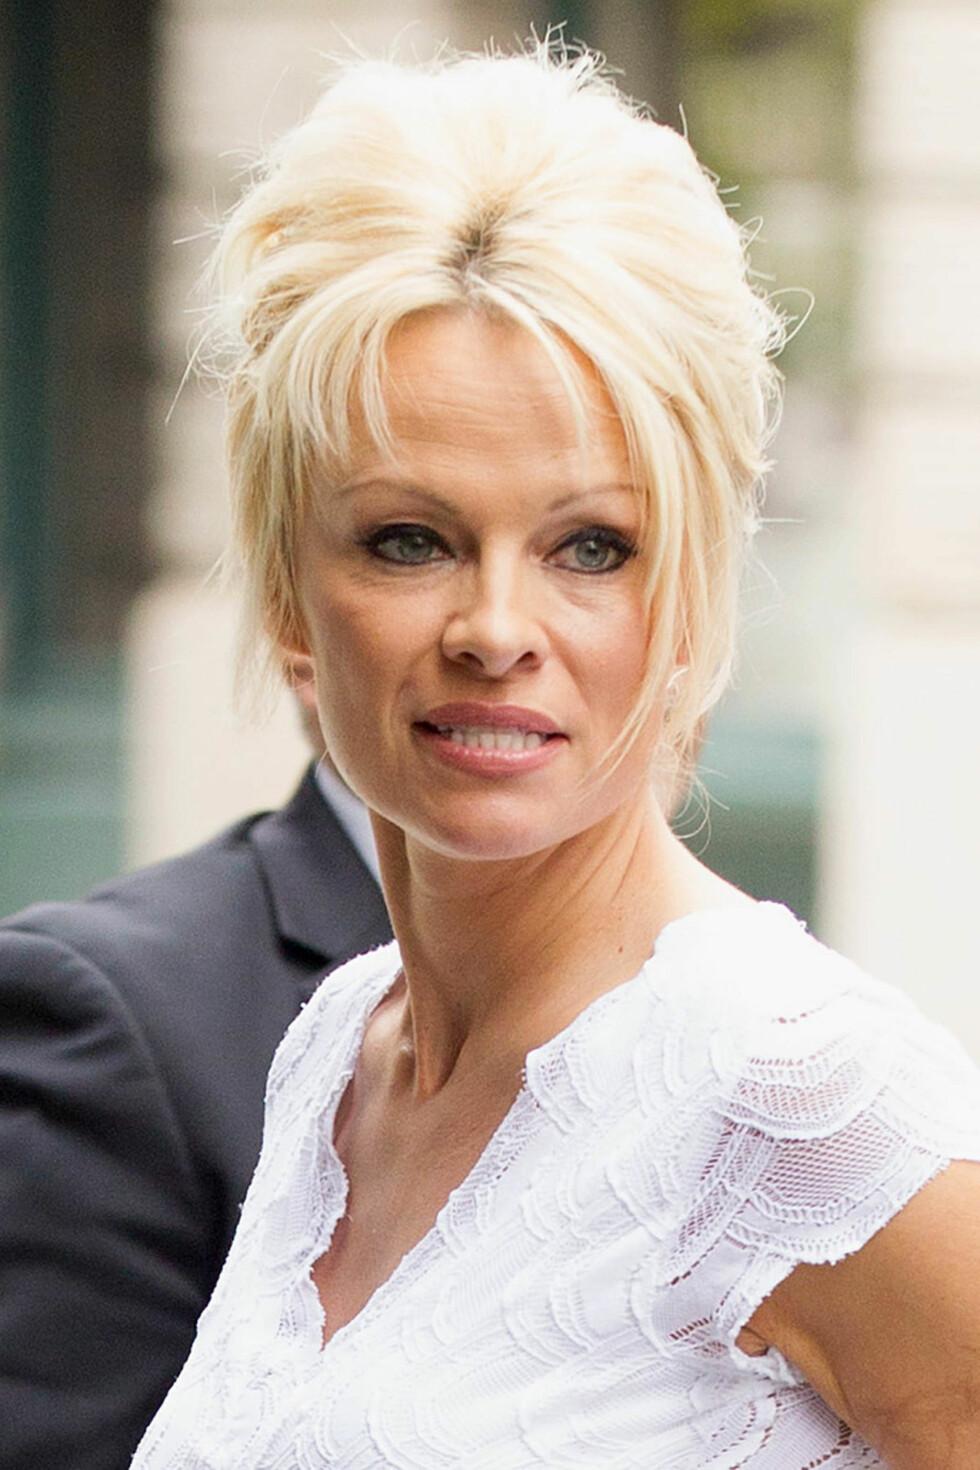 Pamela Anderson i 2014. Baywatch-heltinnen har aldri holdt sine inngrep skjult... Foto: Freddie Baez/startraksphoto.com/